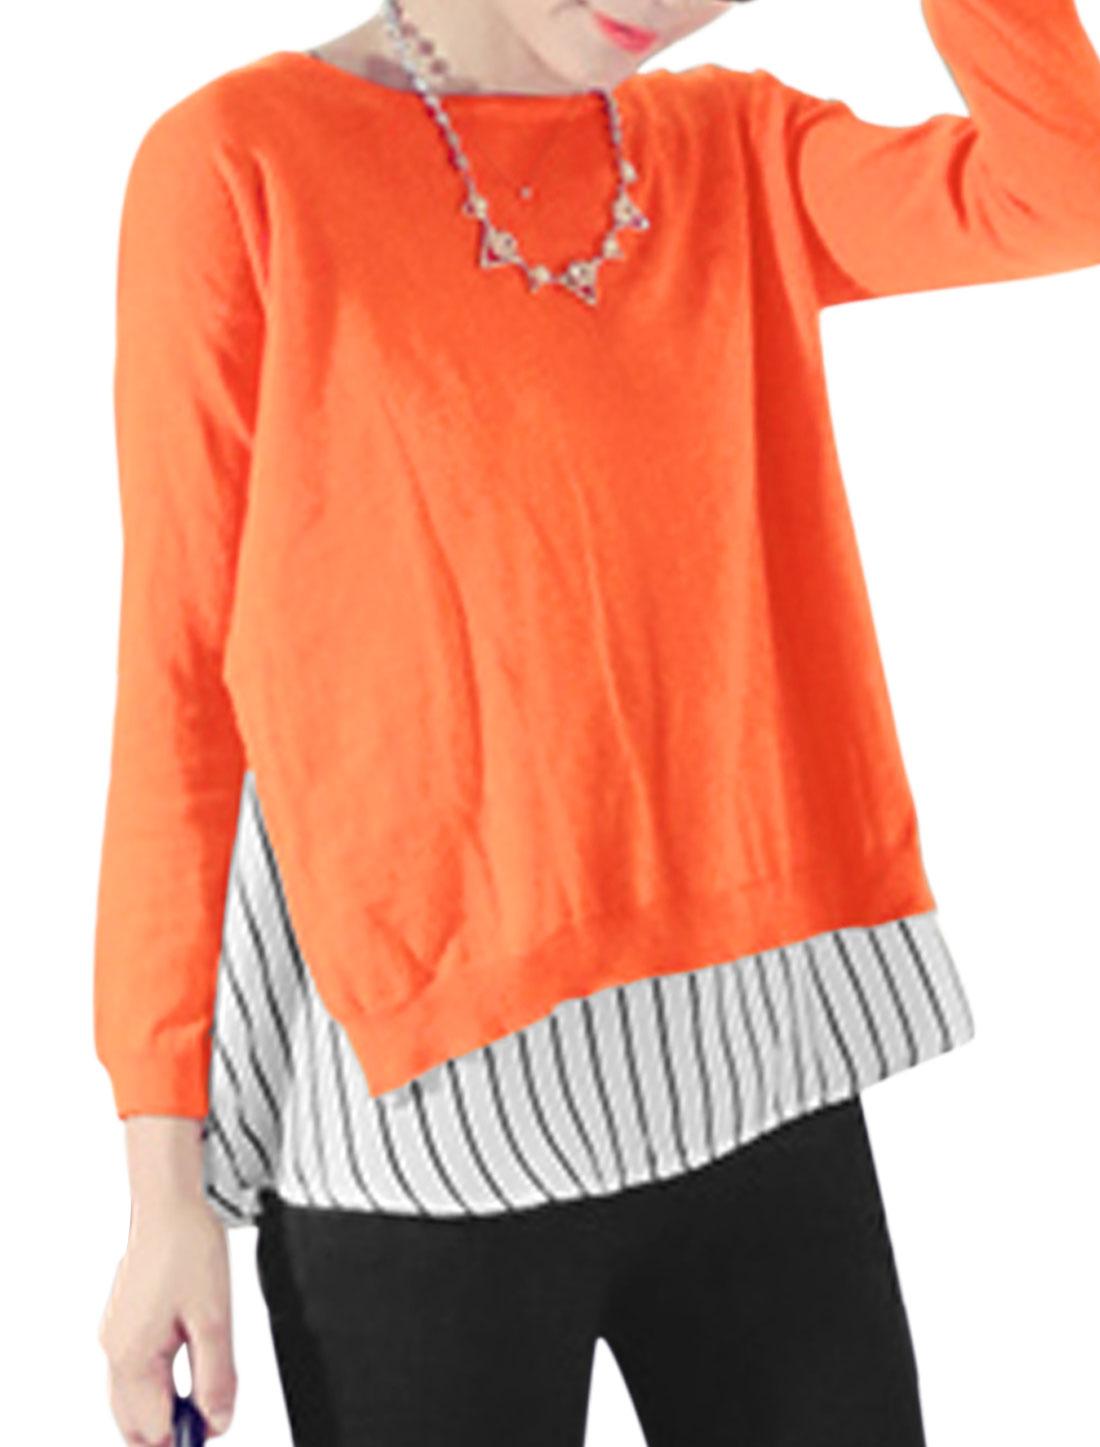 Lady Pullover Semi Sheer Knit Shirt w Stripes Tank Top Orange White XS